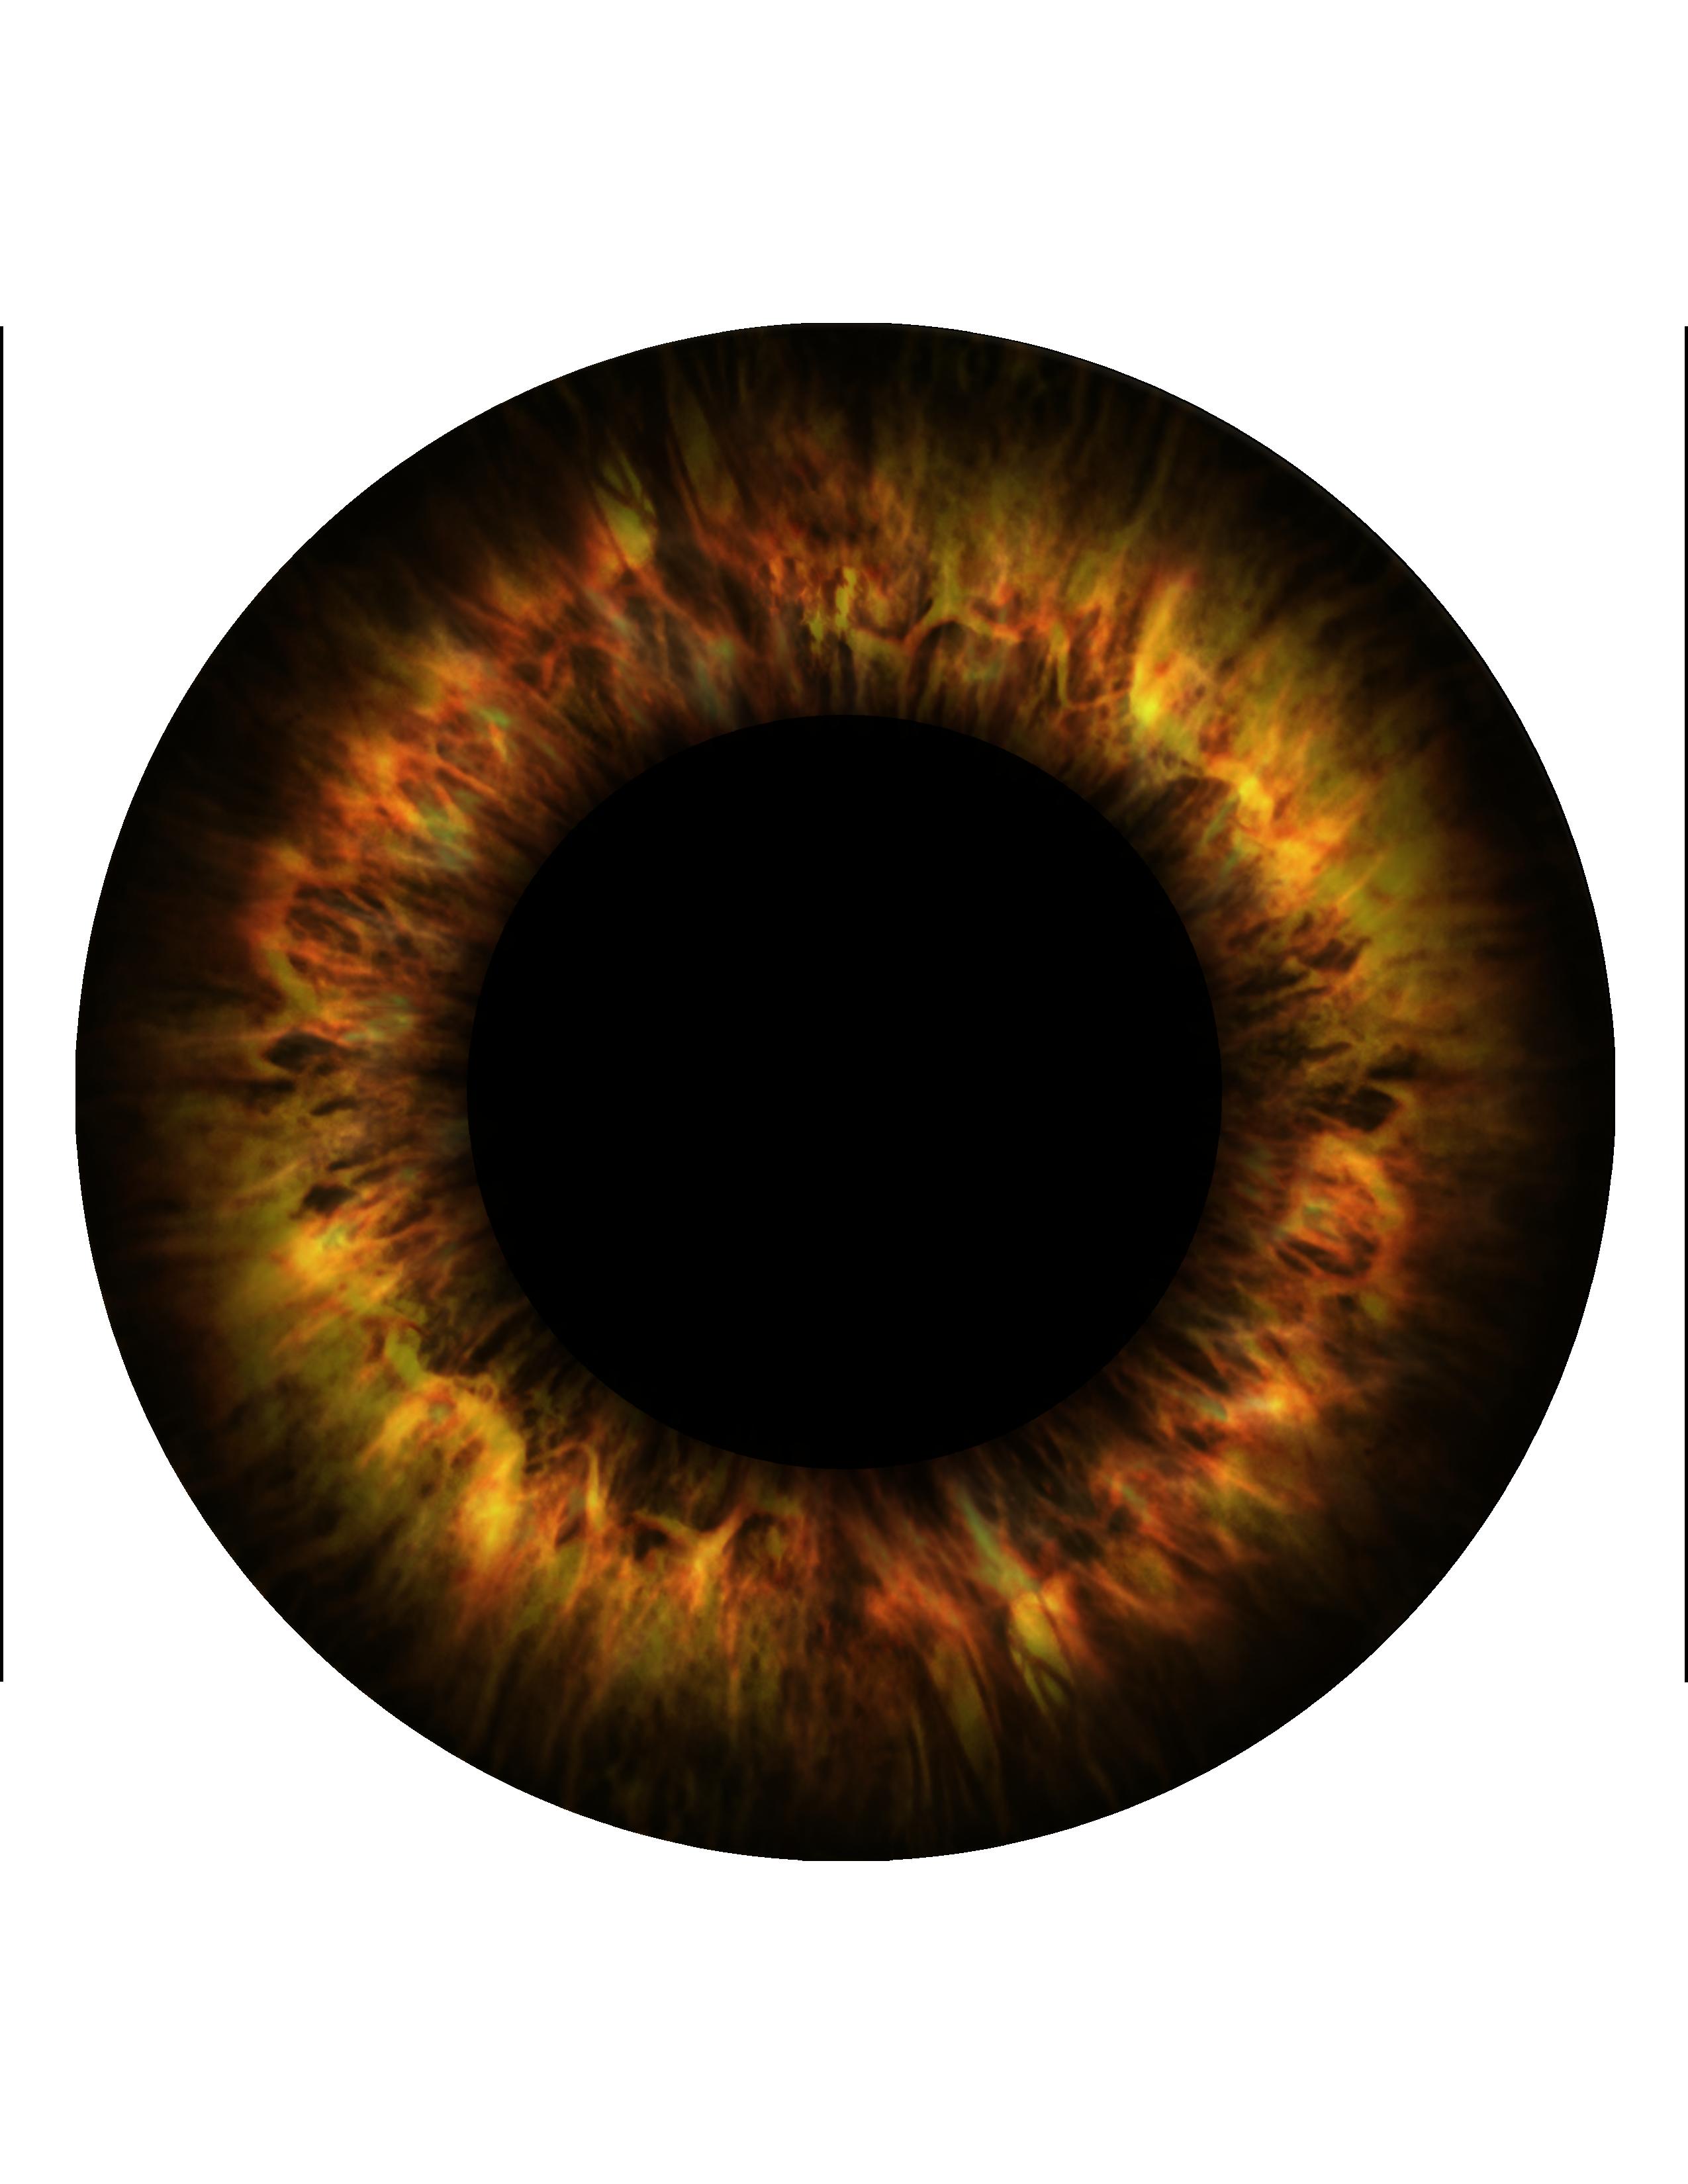 baby yoda eye closeup for printing.png